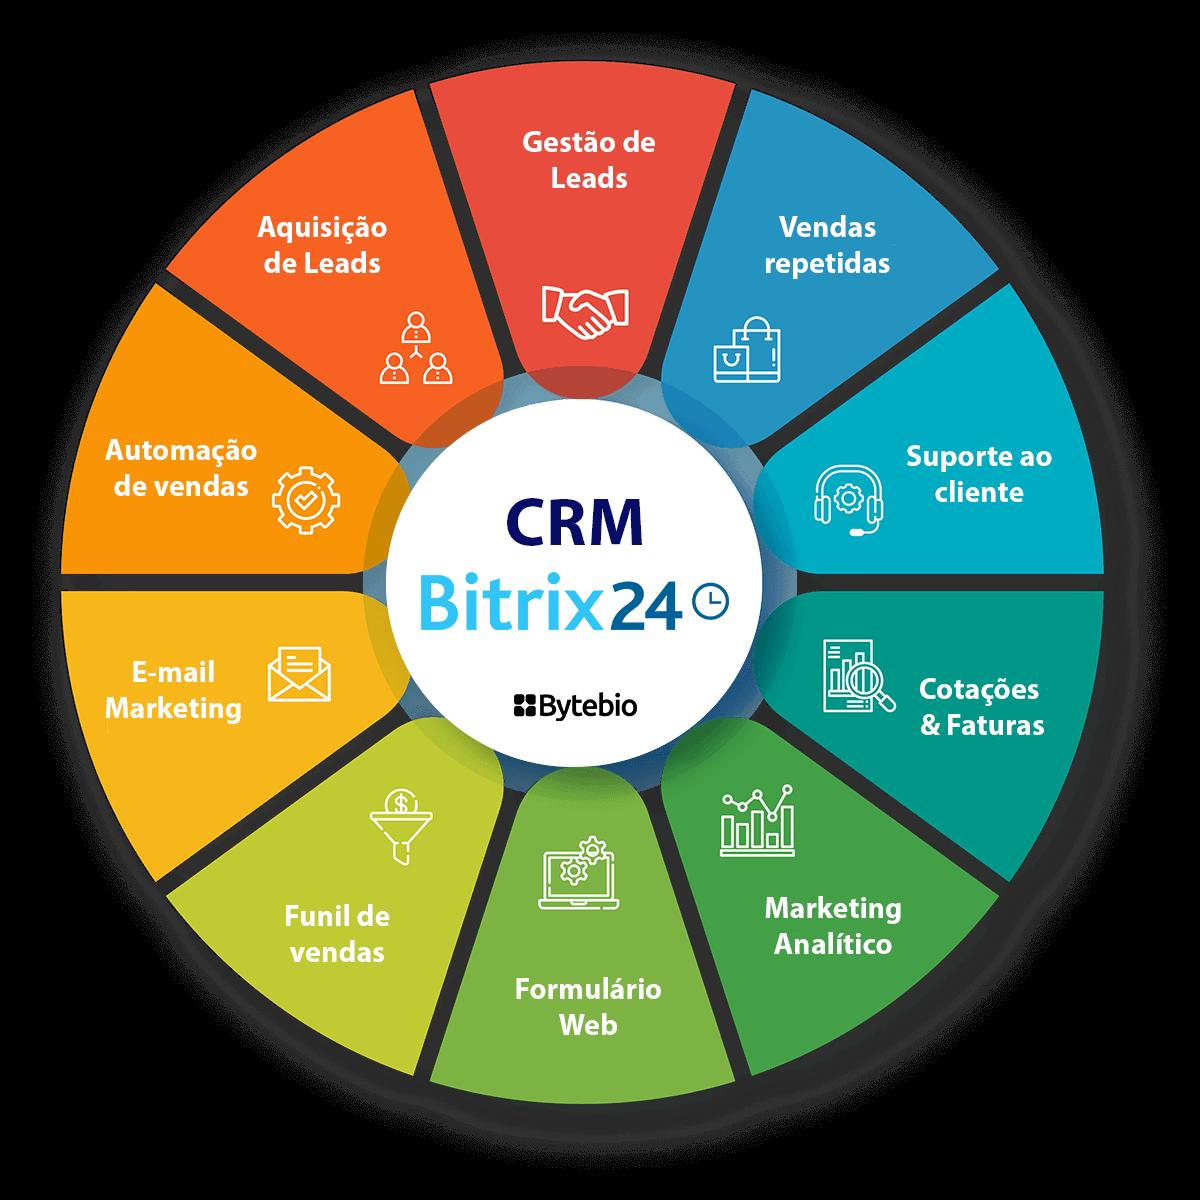 CRM Bitrix24   Bytebio